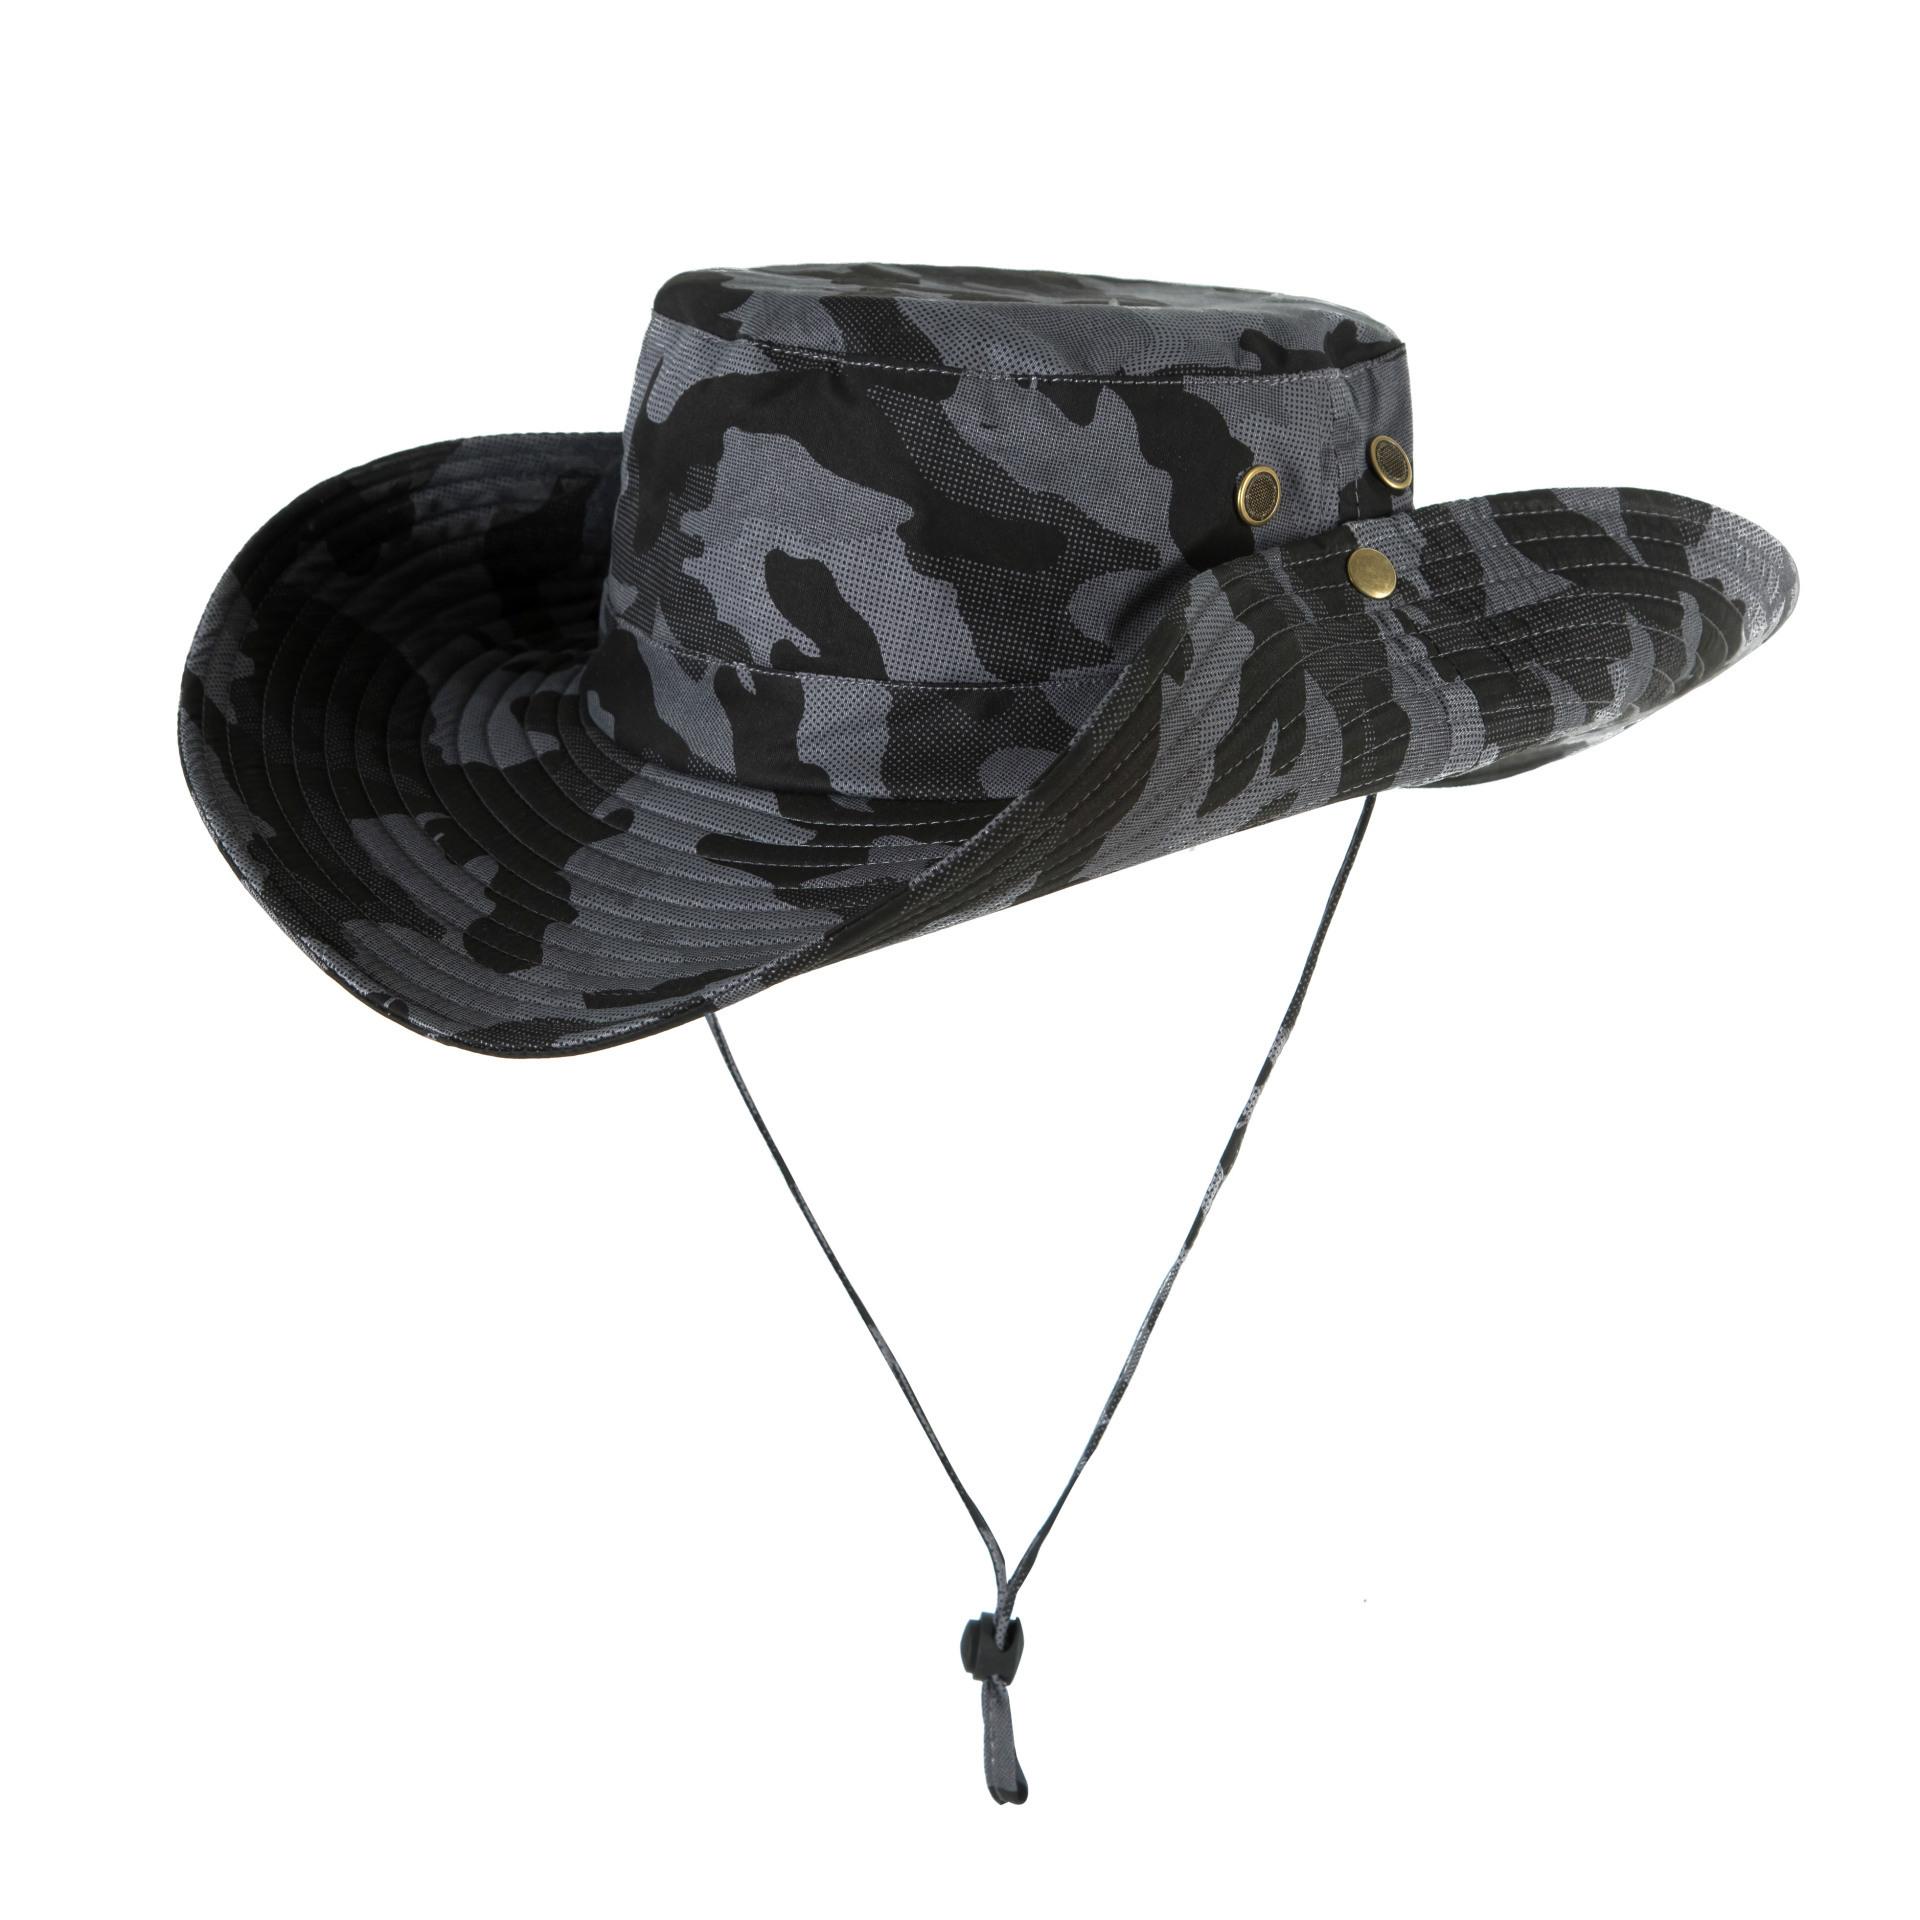 Men Women Summer Hat Outdoor Ultraviolet-proof Fisherman Hat for Travel Climbing Fishing Dark gray camouflage